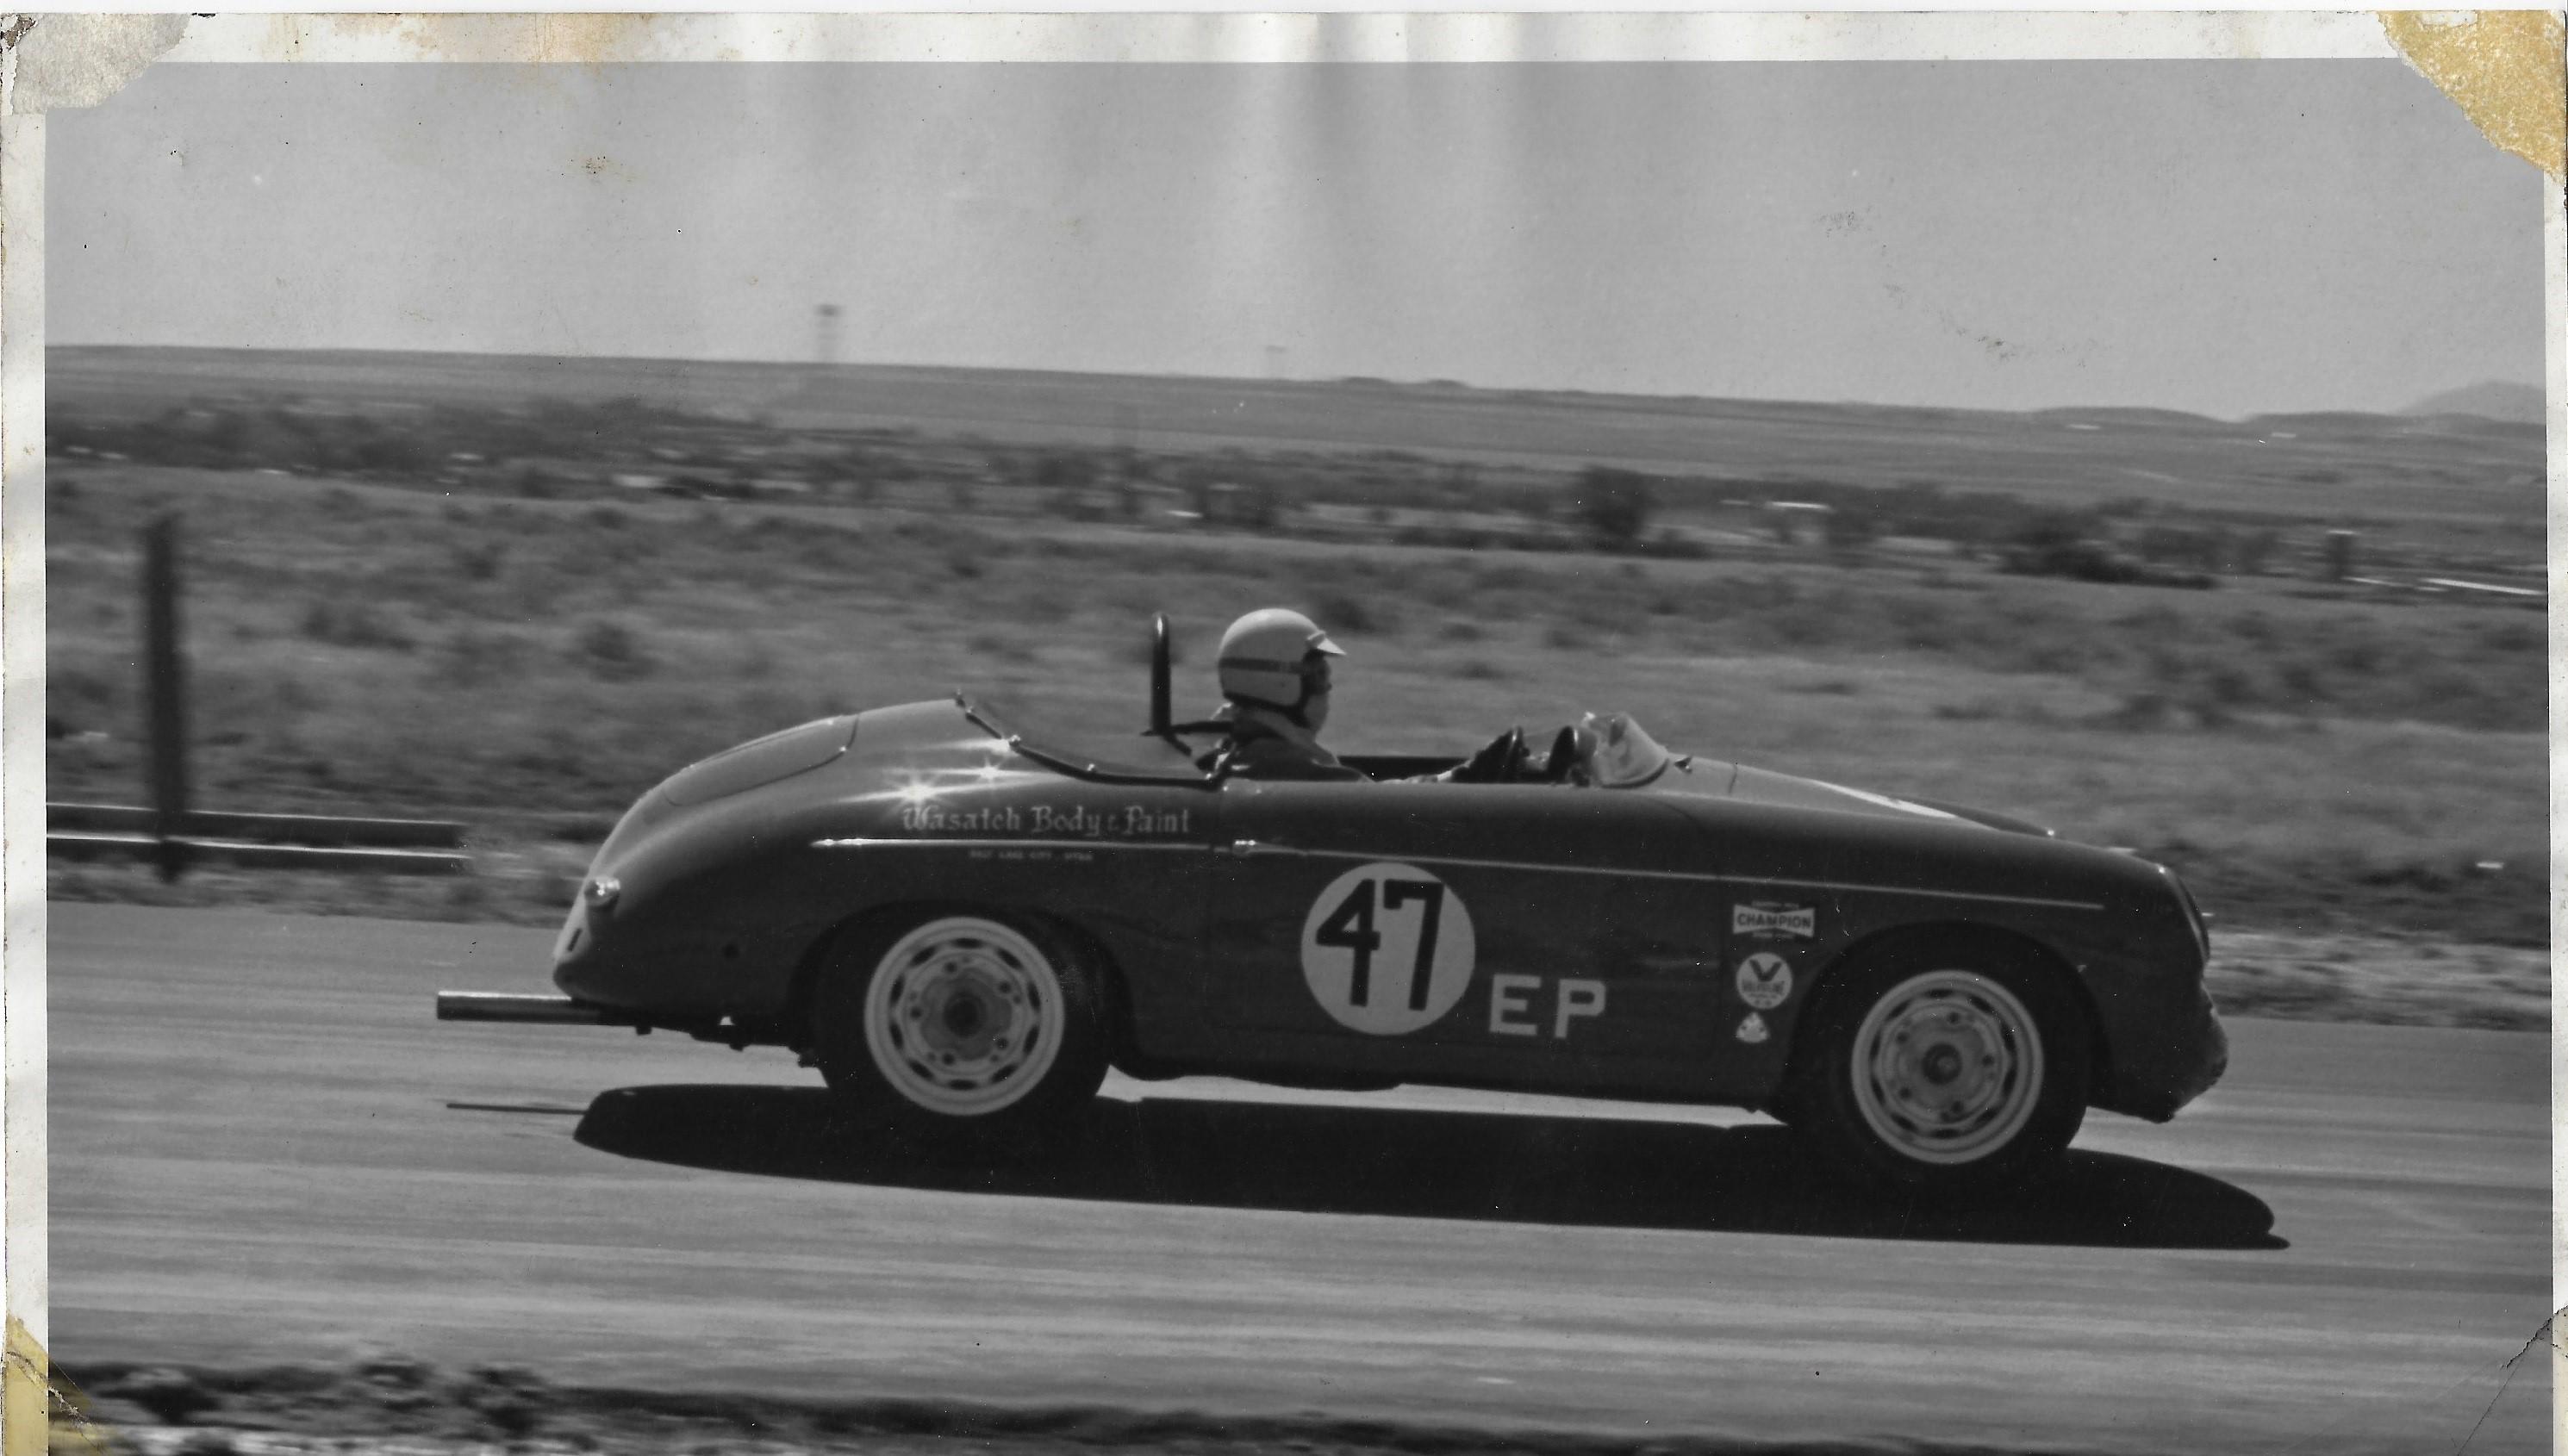 Larry racing in 1971, Phoenix PAR raceway.